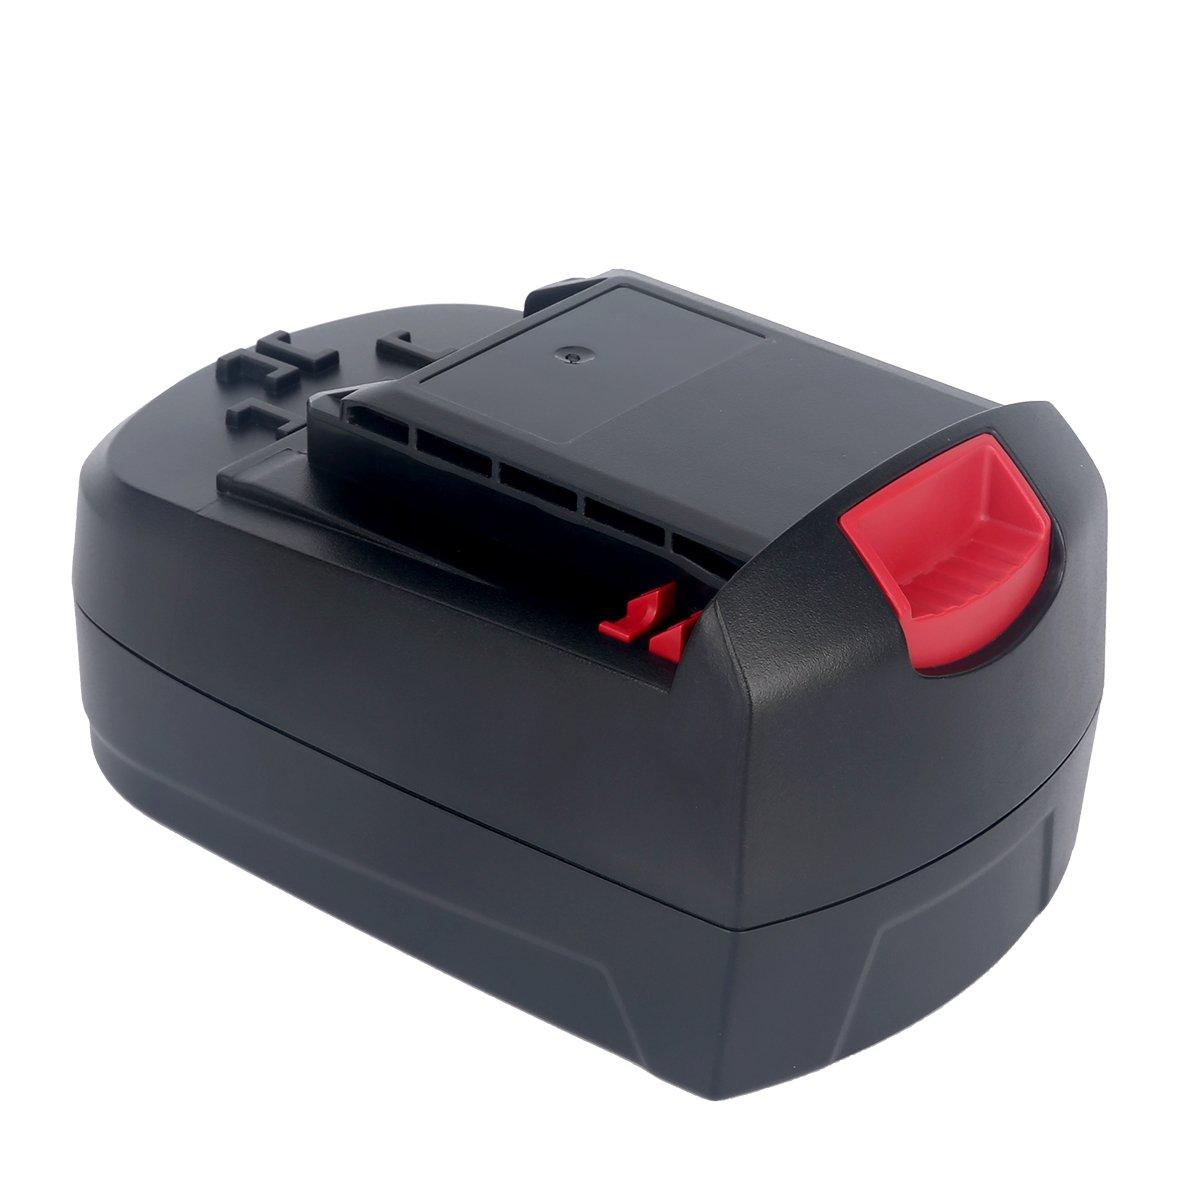 Biswaye 2Pack 18V Battery SB18C SB18A SB18B for Skil 18V Select System Cordless Tools 2810 2888 2895 2897 2898 4570 5850 5995 7305 9350, 3000mAh Ni-Cd by Biswaye (Image #9)